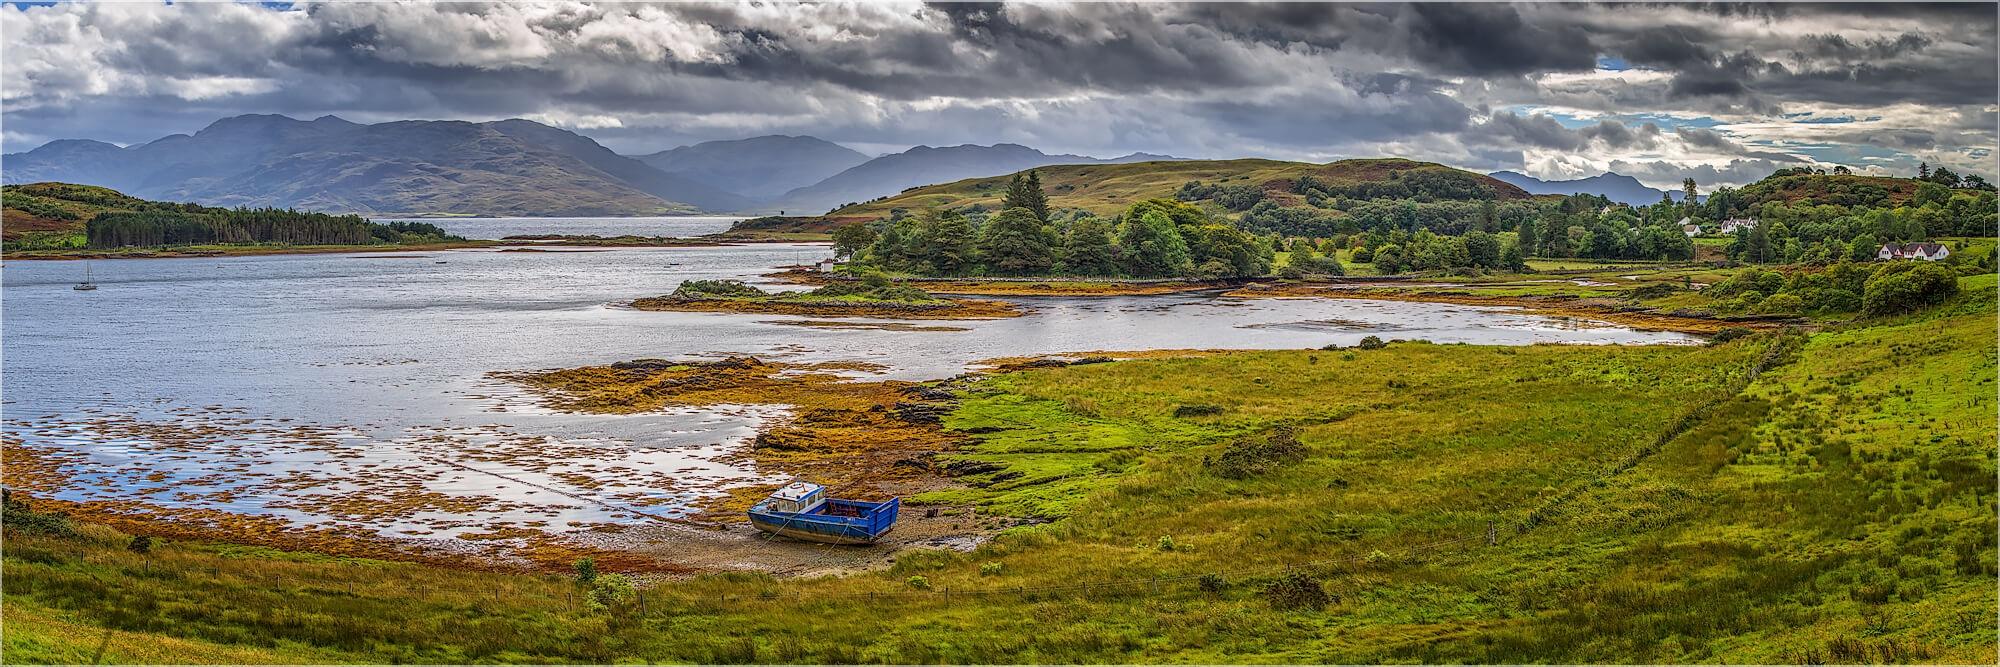 Panoramabild Landschaft Isle of Skye Schottland